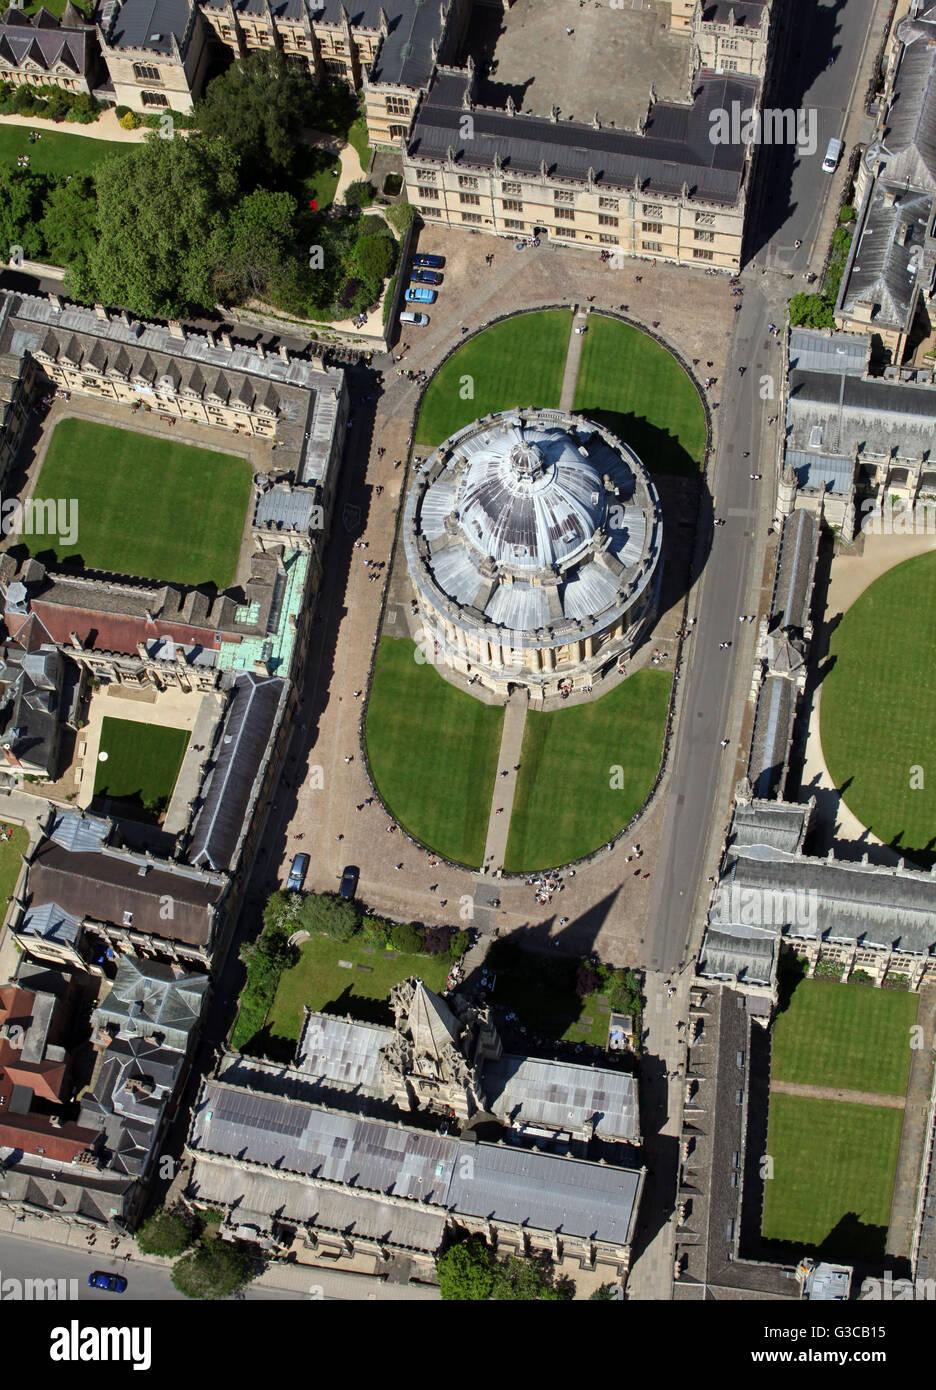 Luftaufnahme des Radcliffe Kamera & Bodleian Library, Oxford University, UK Stockbild